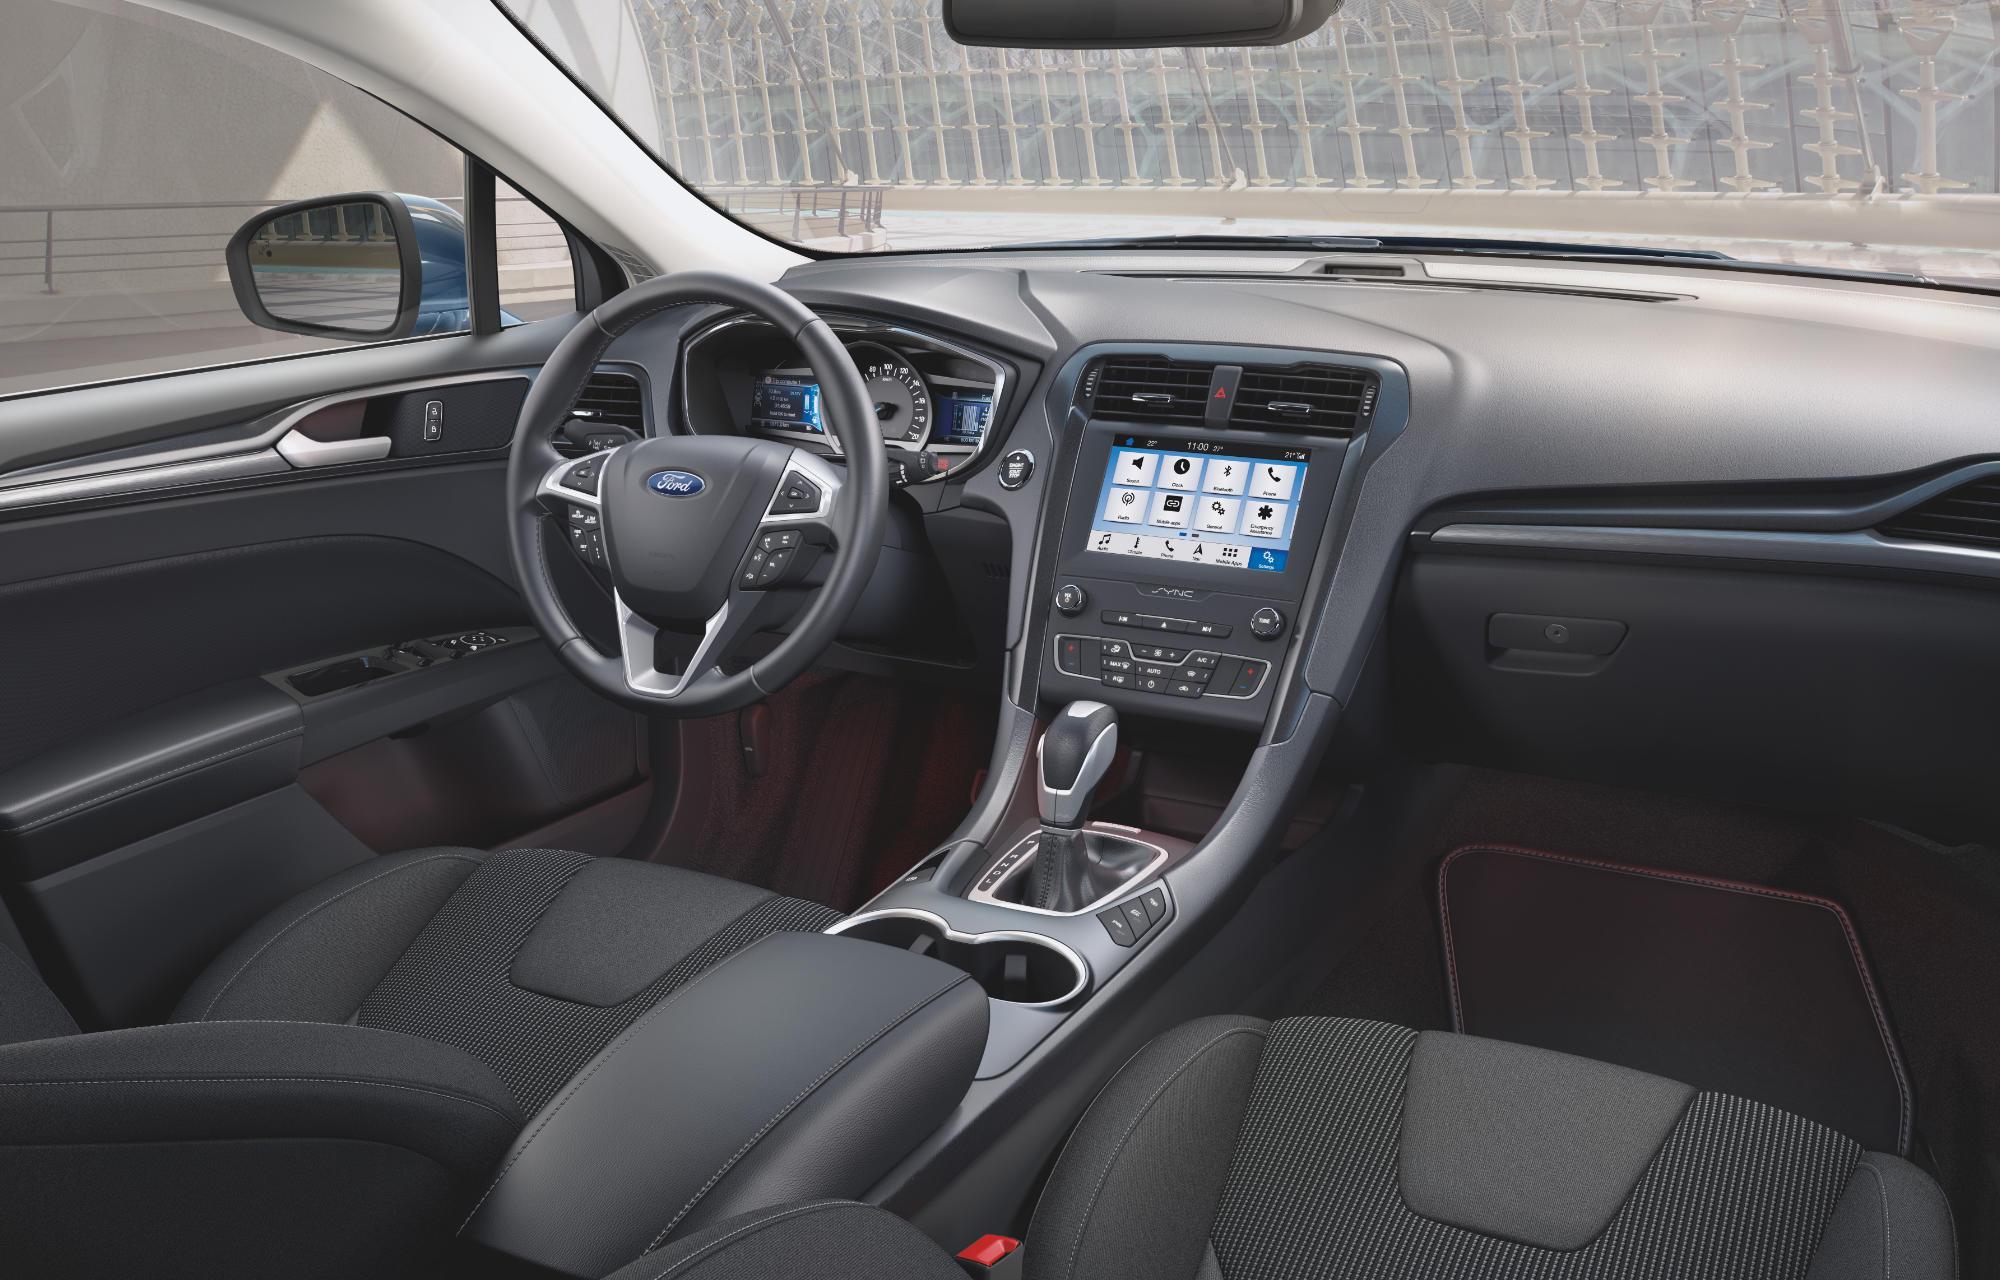 Ford Mondeo w BCH Chwaliński